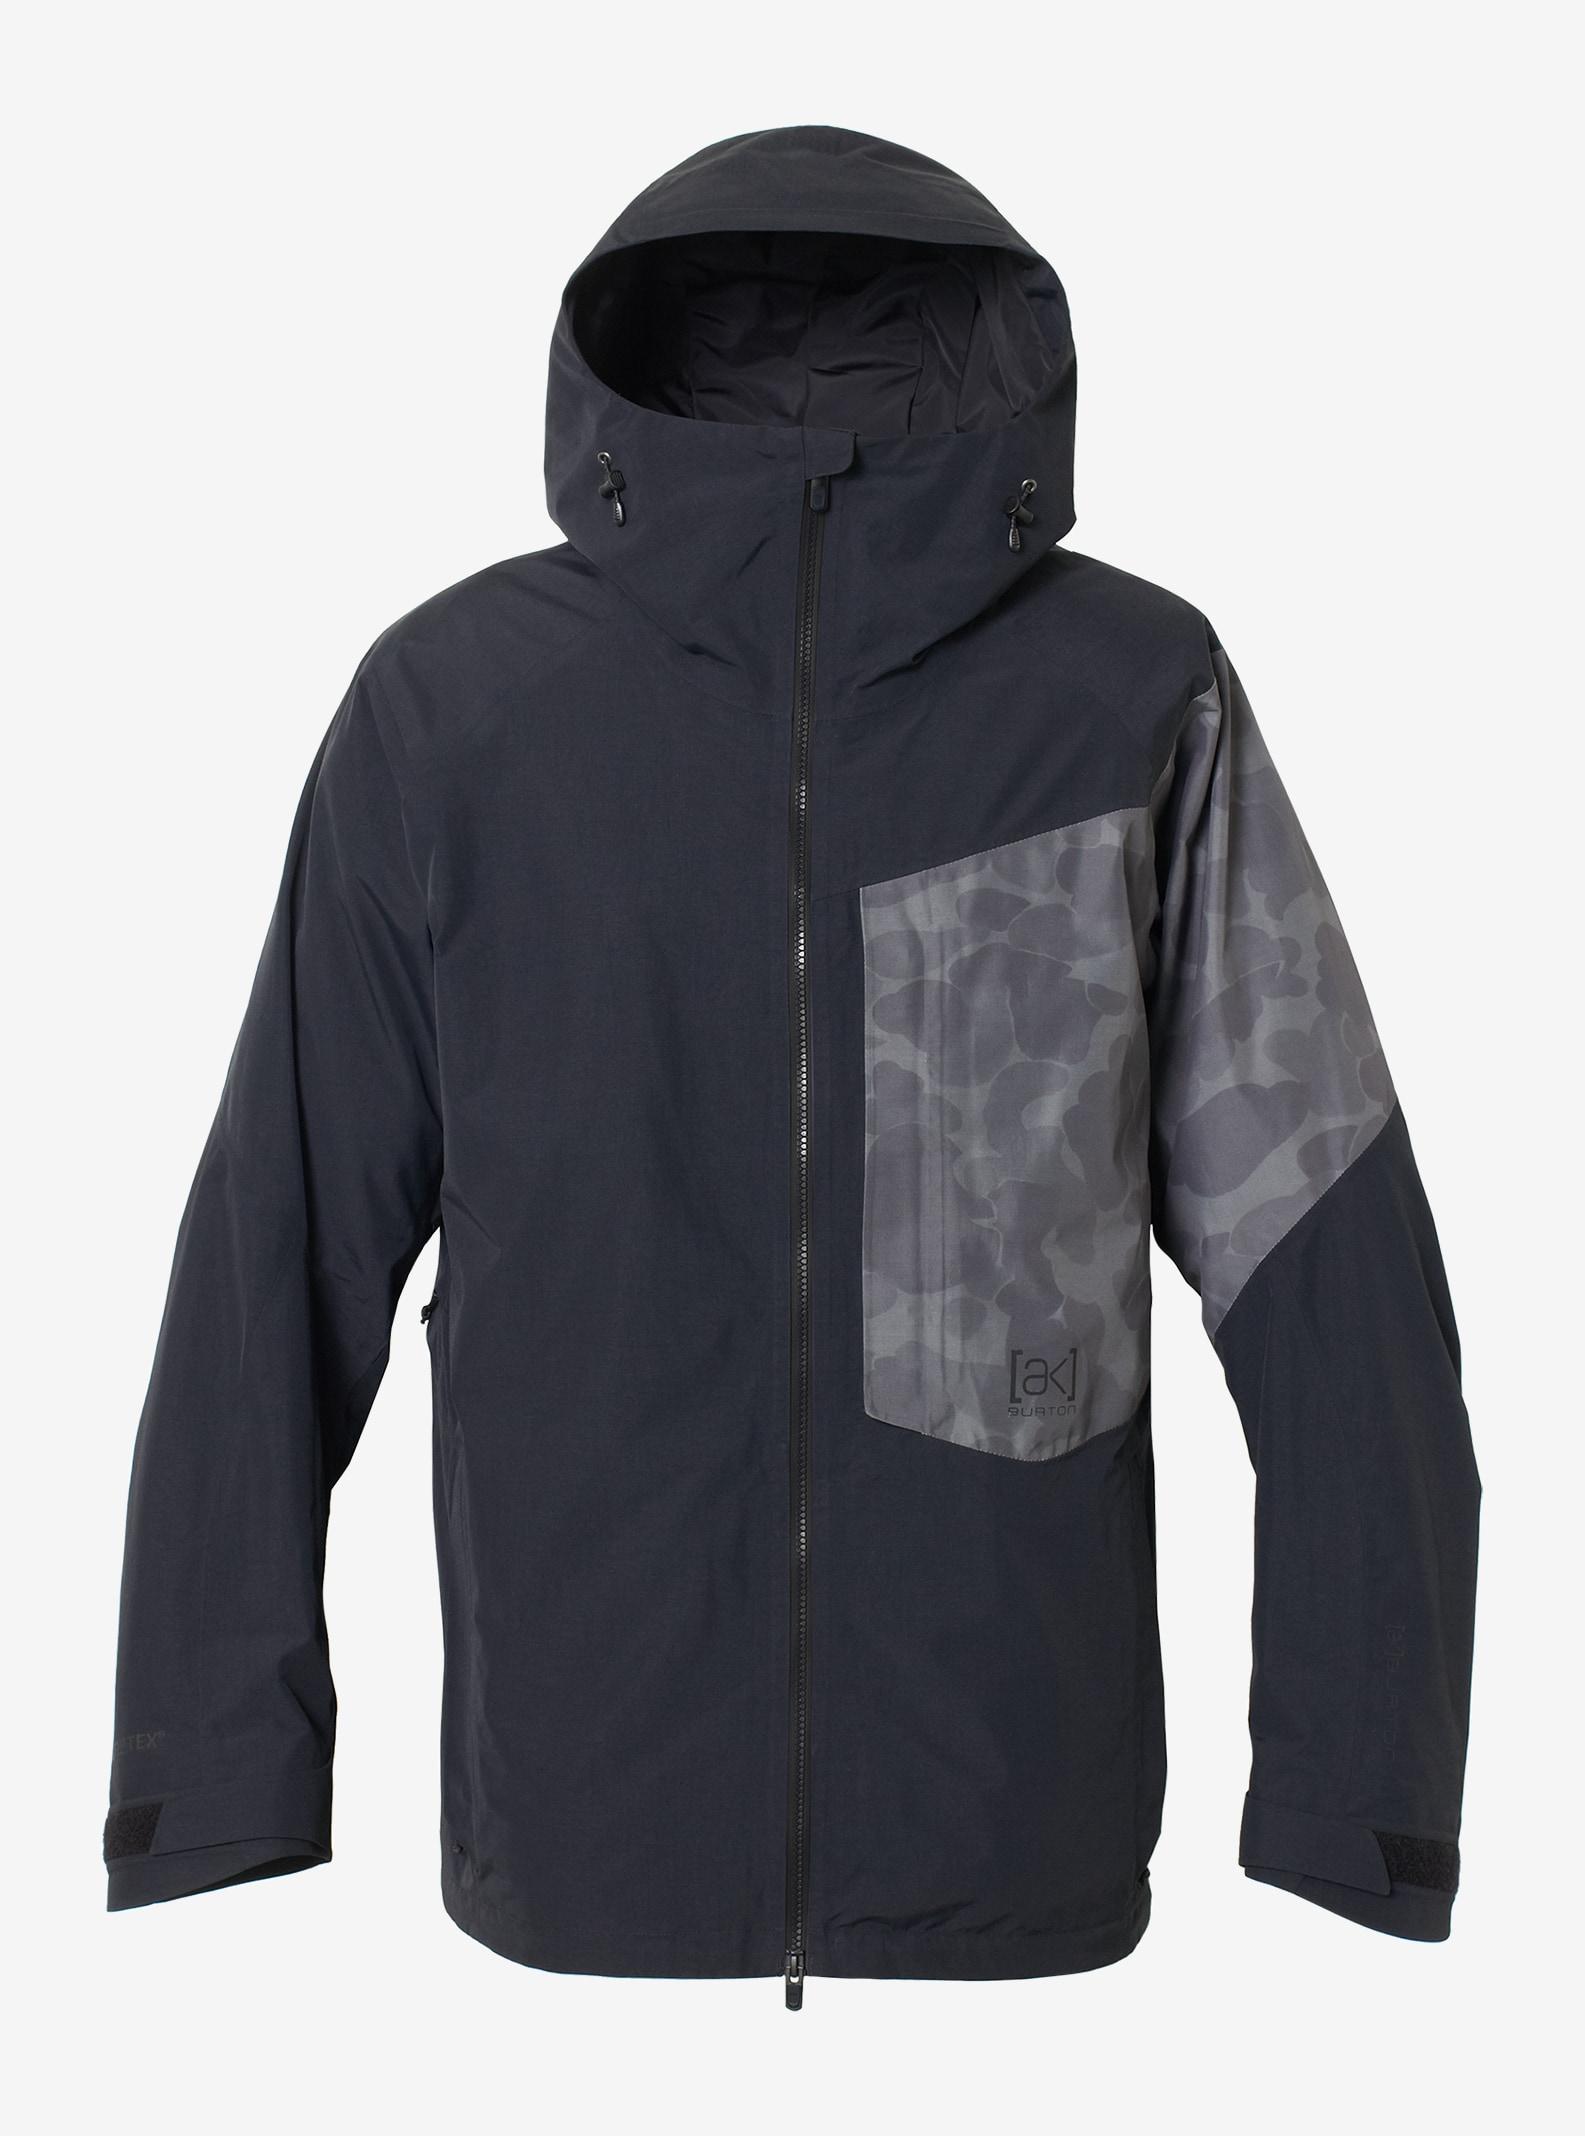 Men's Burton [ak] GORE-TEX® 2L Boom Jacket shown in True Black / Faded Kodiak Camo